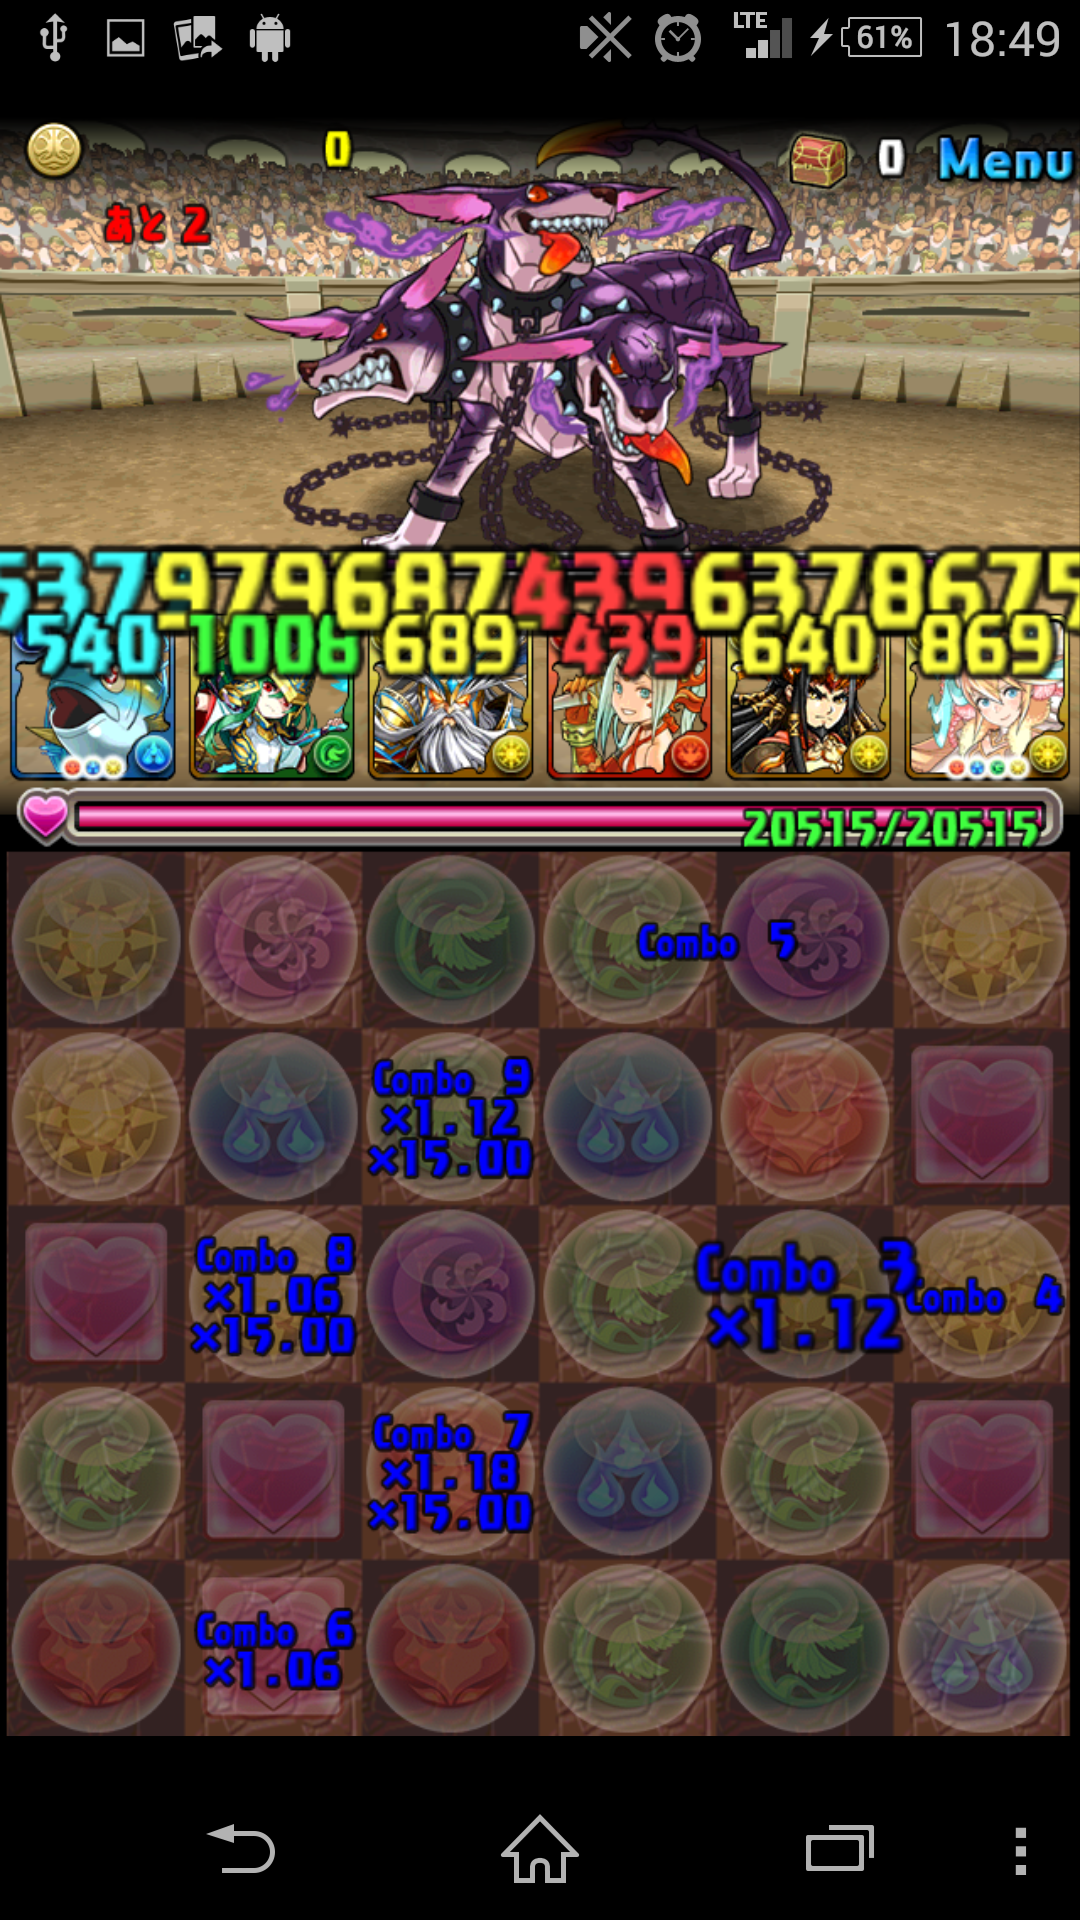 Screenshot_2014-09-09-18-49-13.png